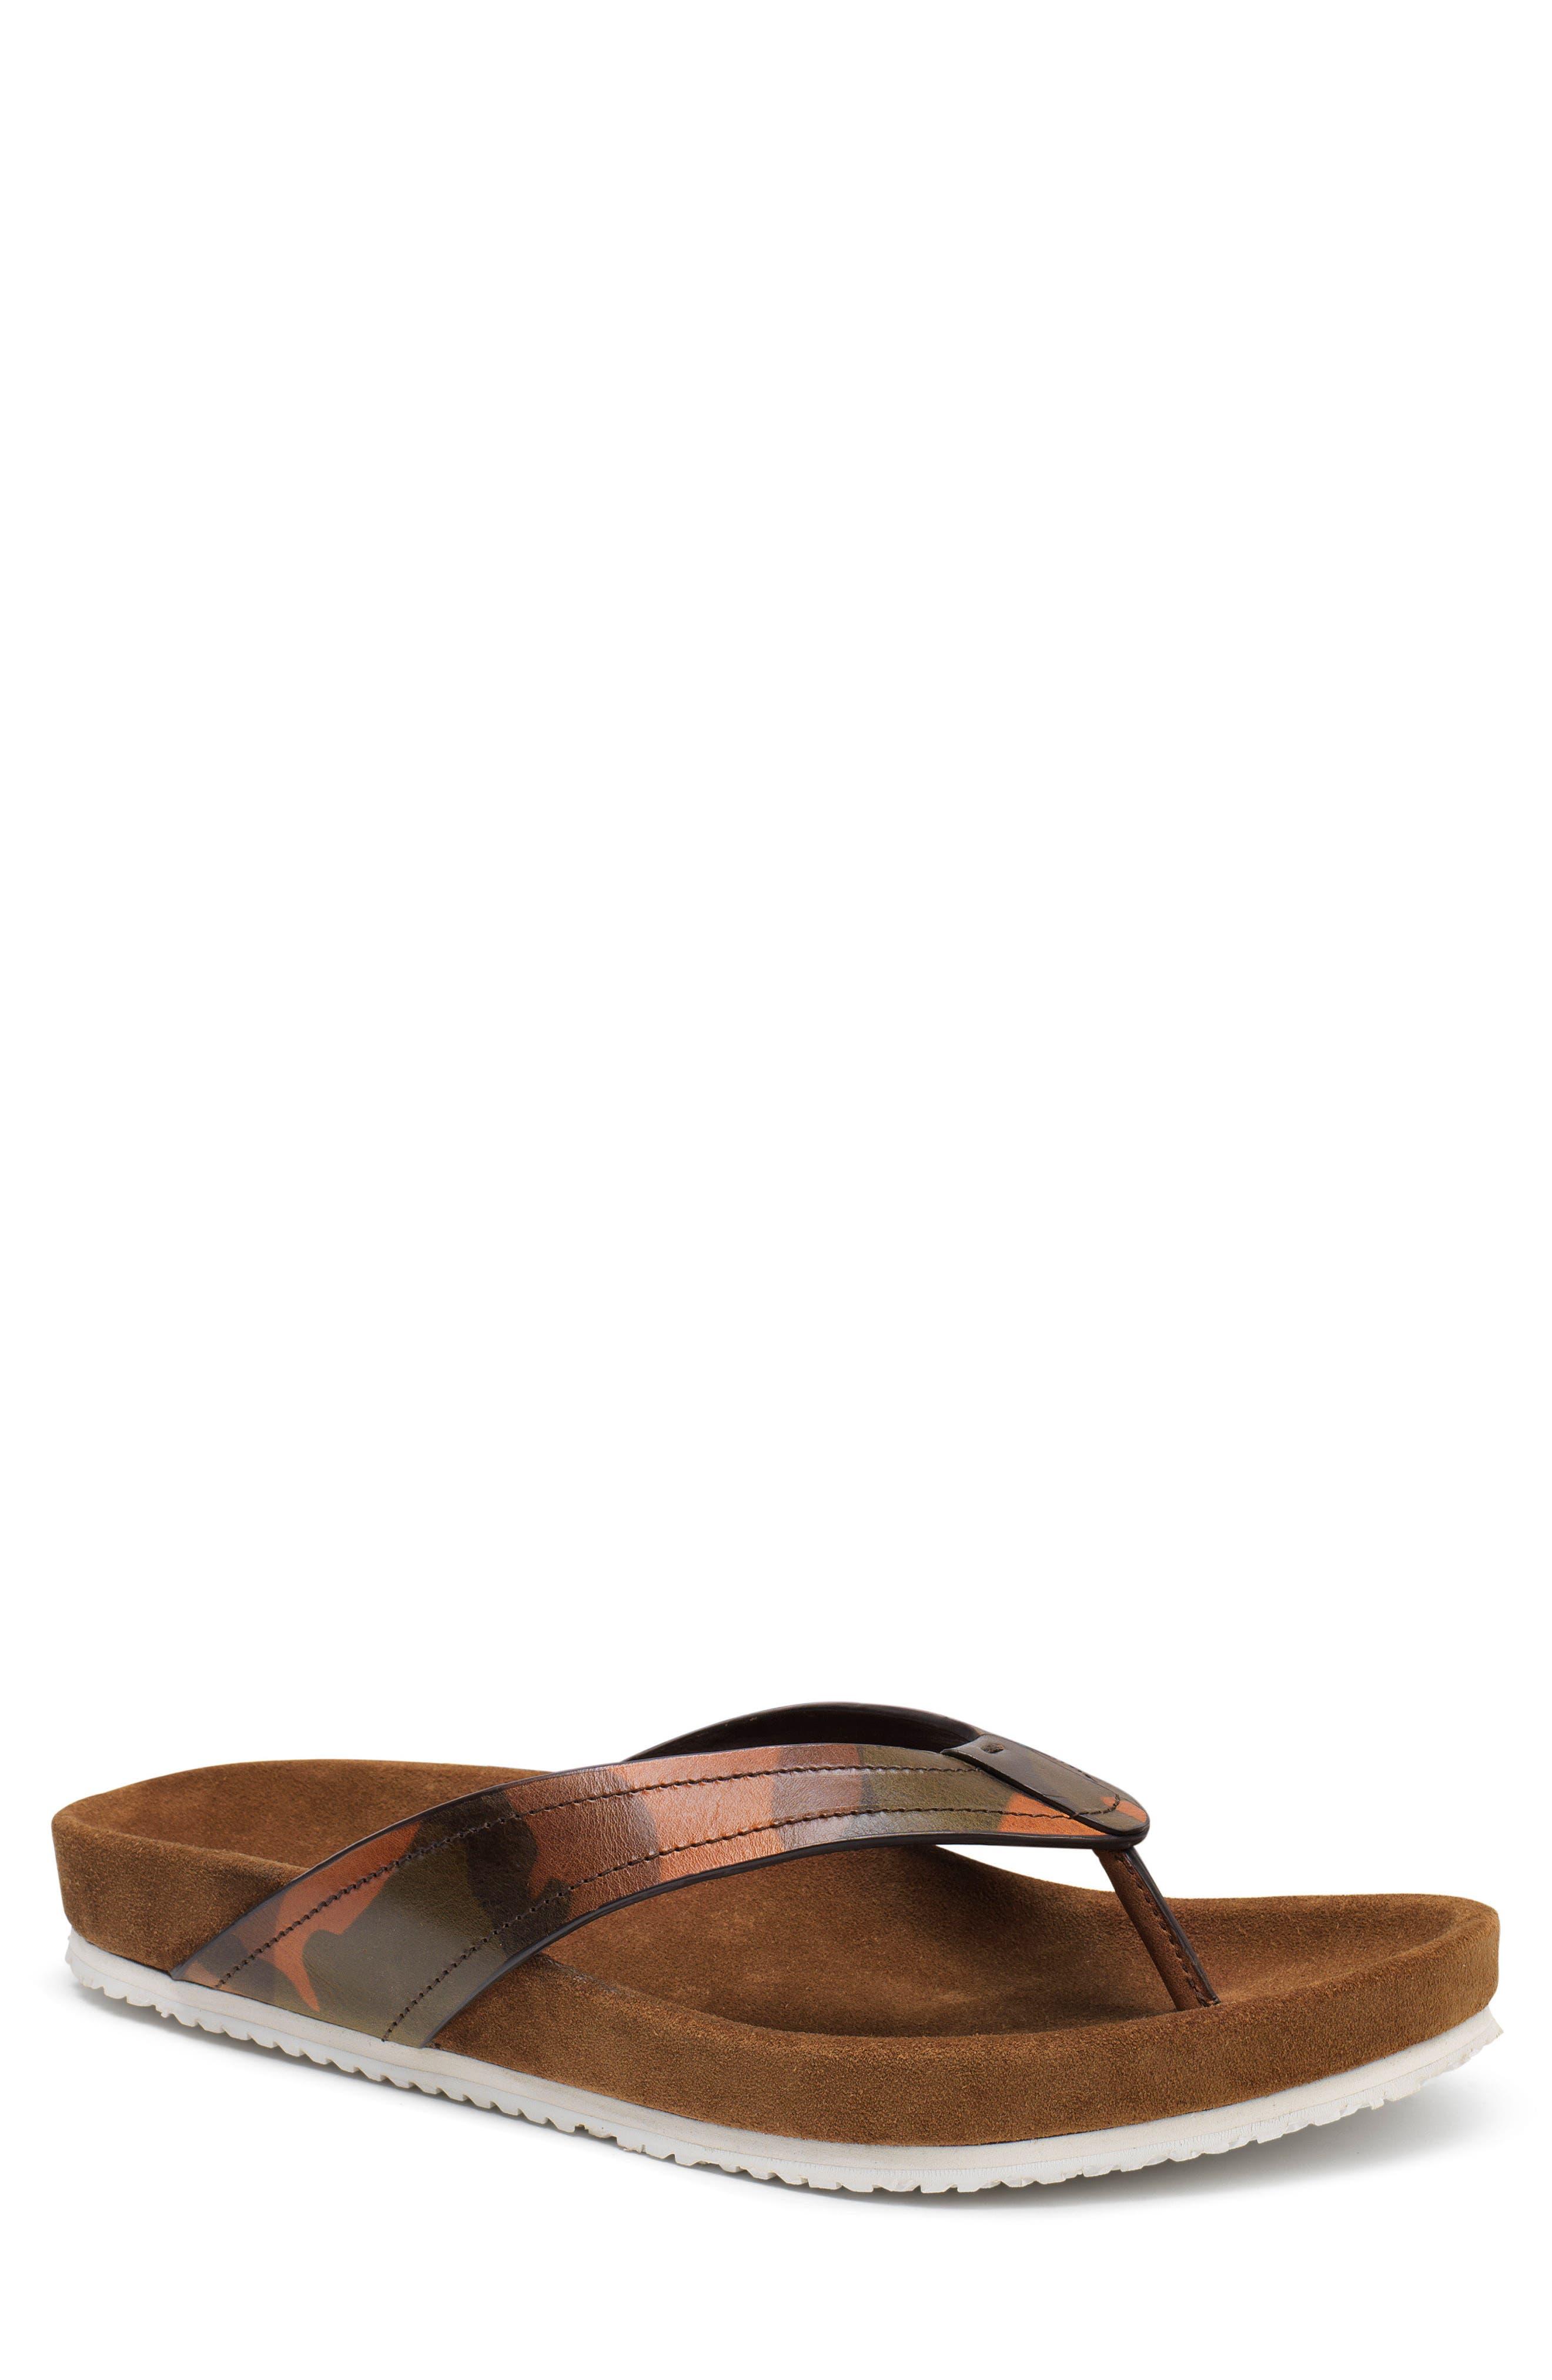 Fleming Flip Flop,                             Main thumbnail 1, color,                             Camoflage Leather